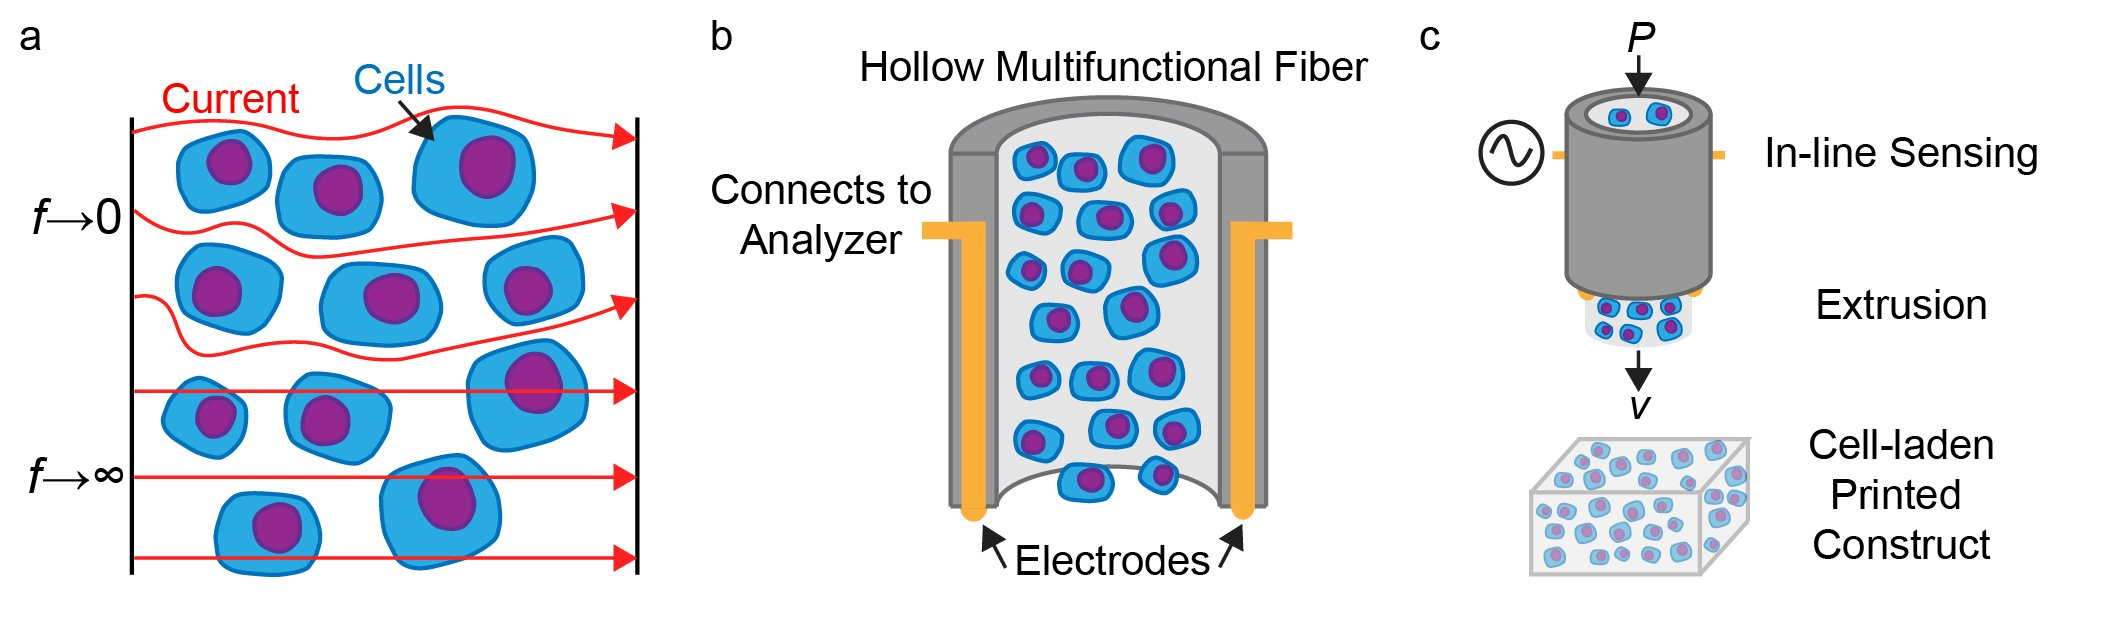 3D bioprinting using hollow multifunctional fiber impedimetric sensors, Biofabrication, 12, 035026 (2020)